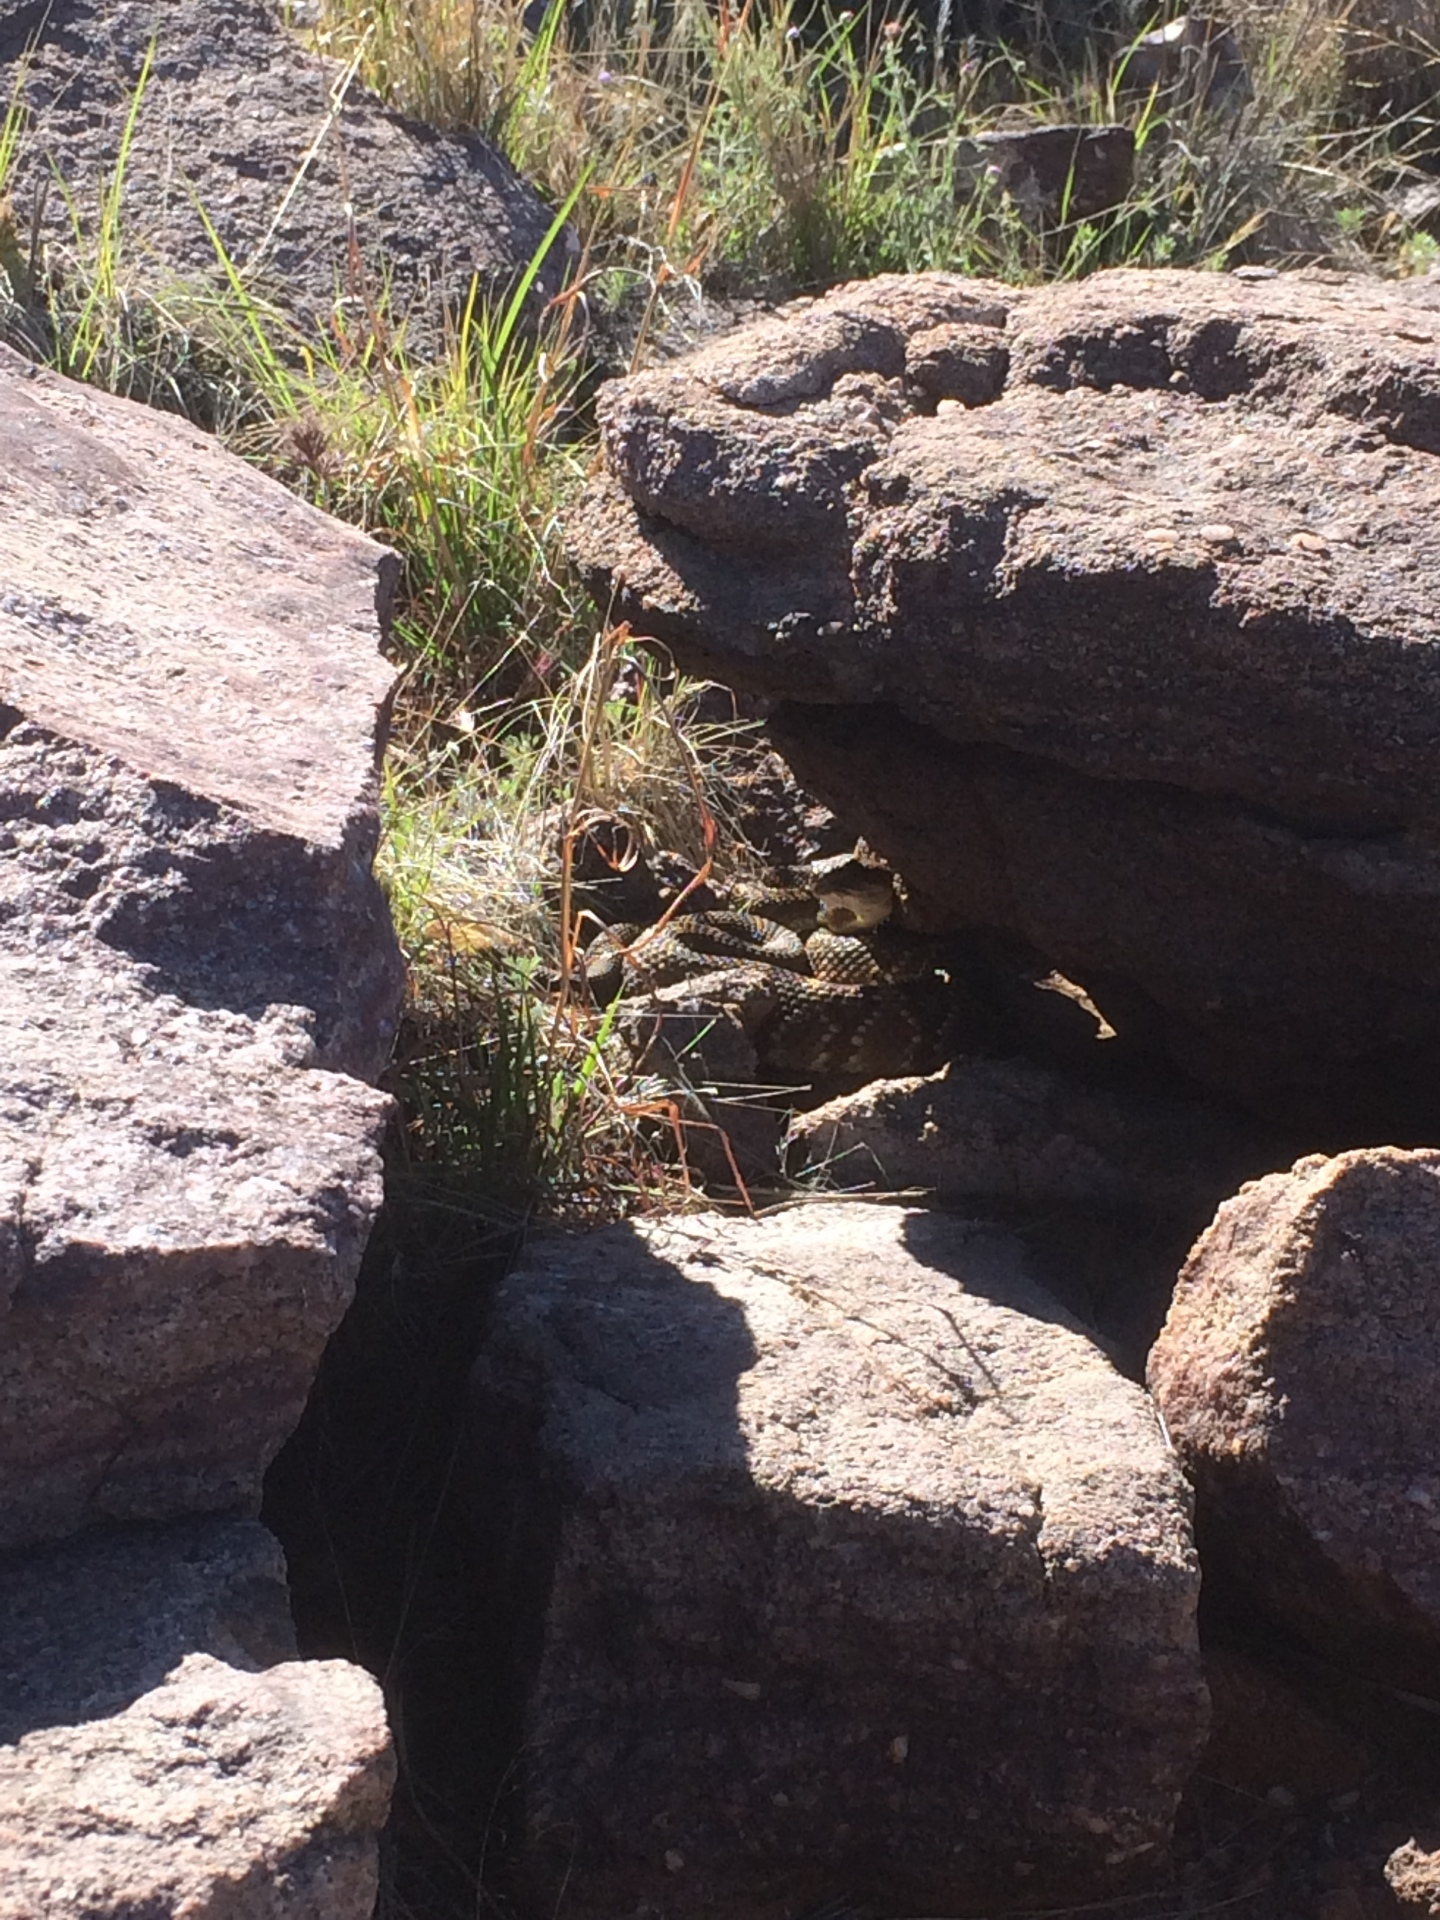 Western Diamondback Rattlesnake, Arizona Backpacking